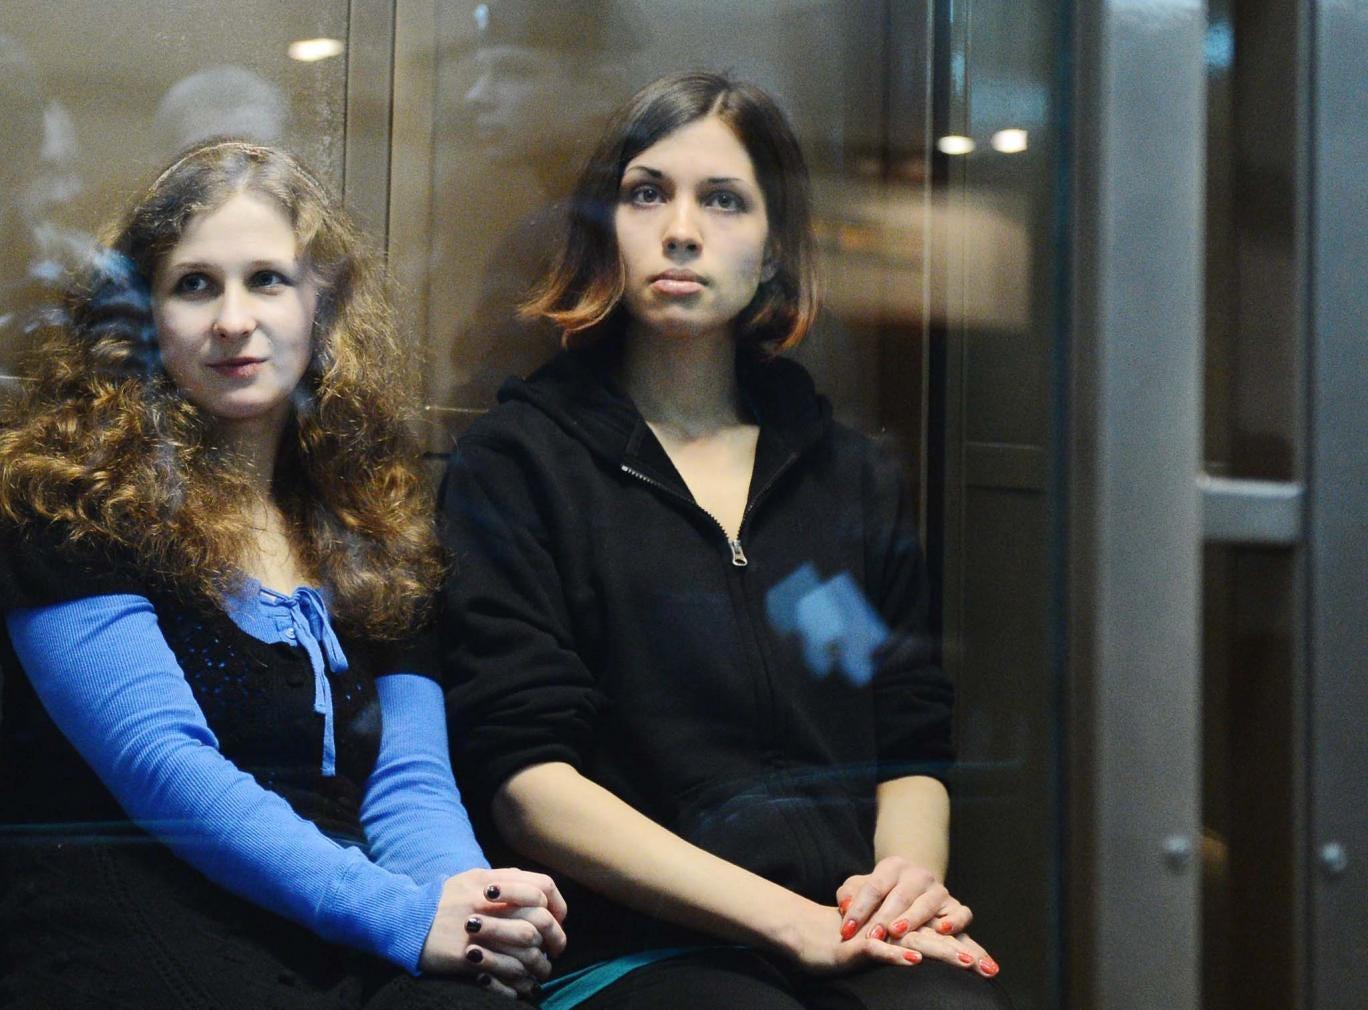 Jailed Pussy Riot members Maria Alyokhina and Nadezhda Tolokonnikova in court in Moscow.